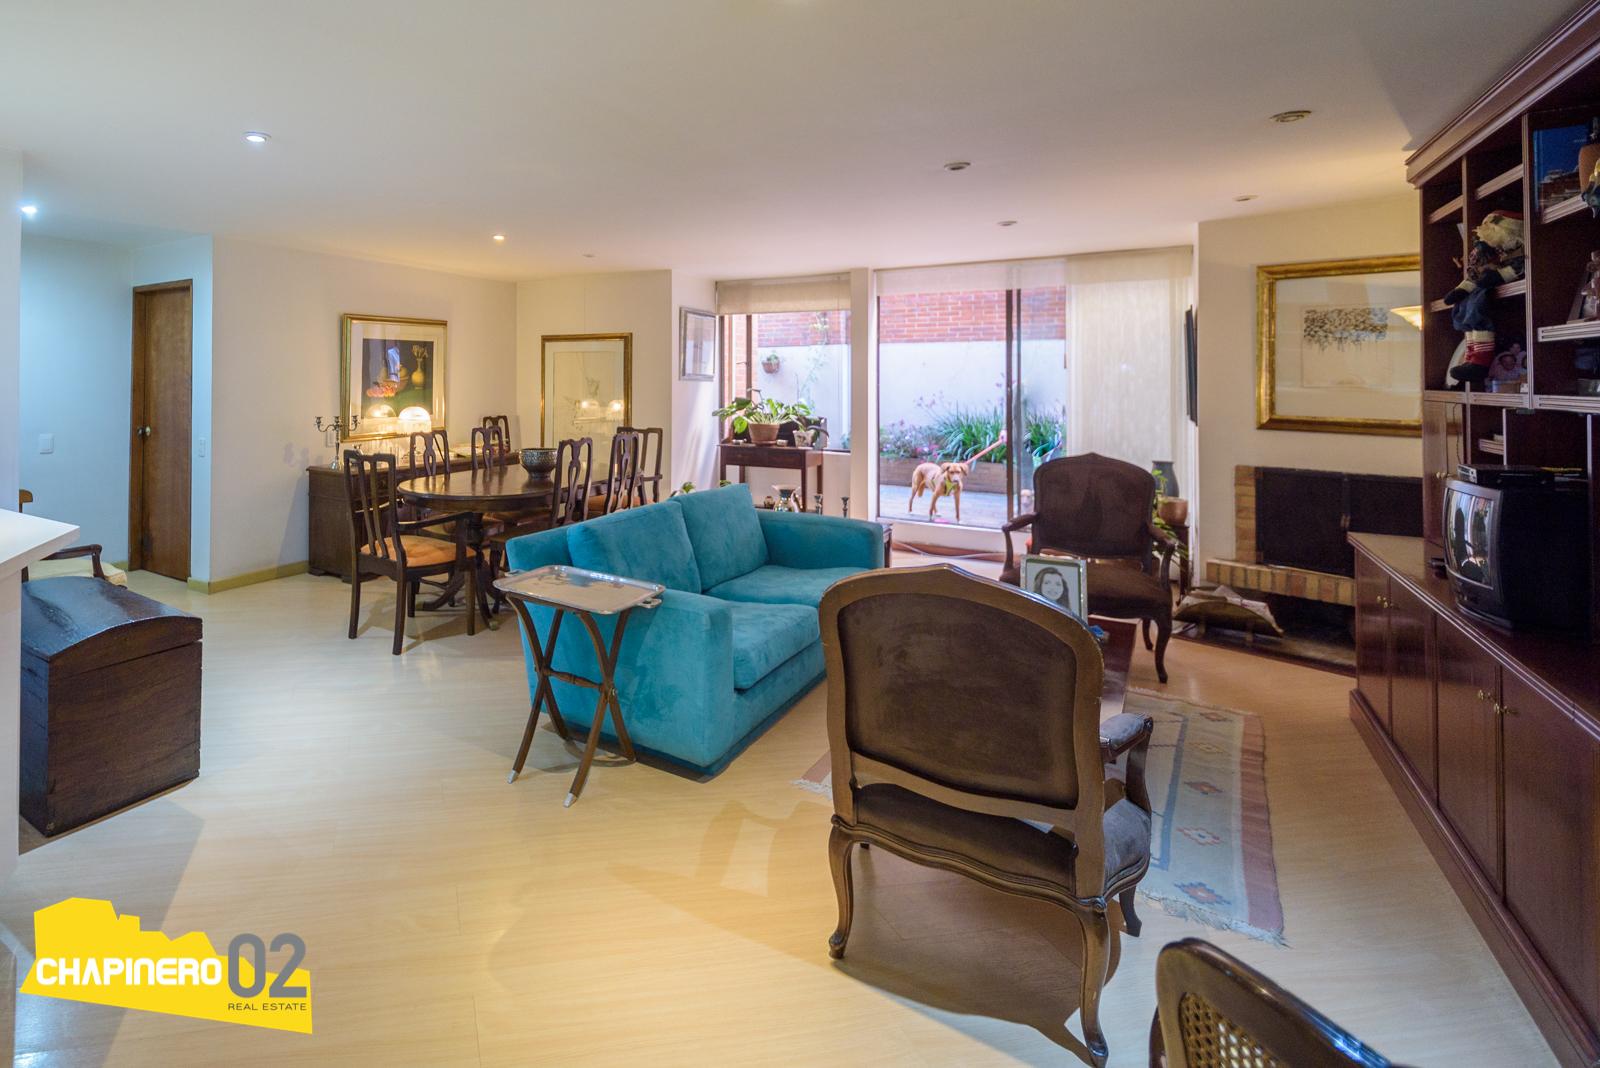 Apto Venta :: 68 +58 m² :: Bellavista :: $530 M